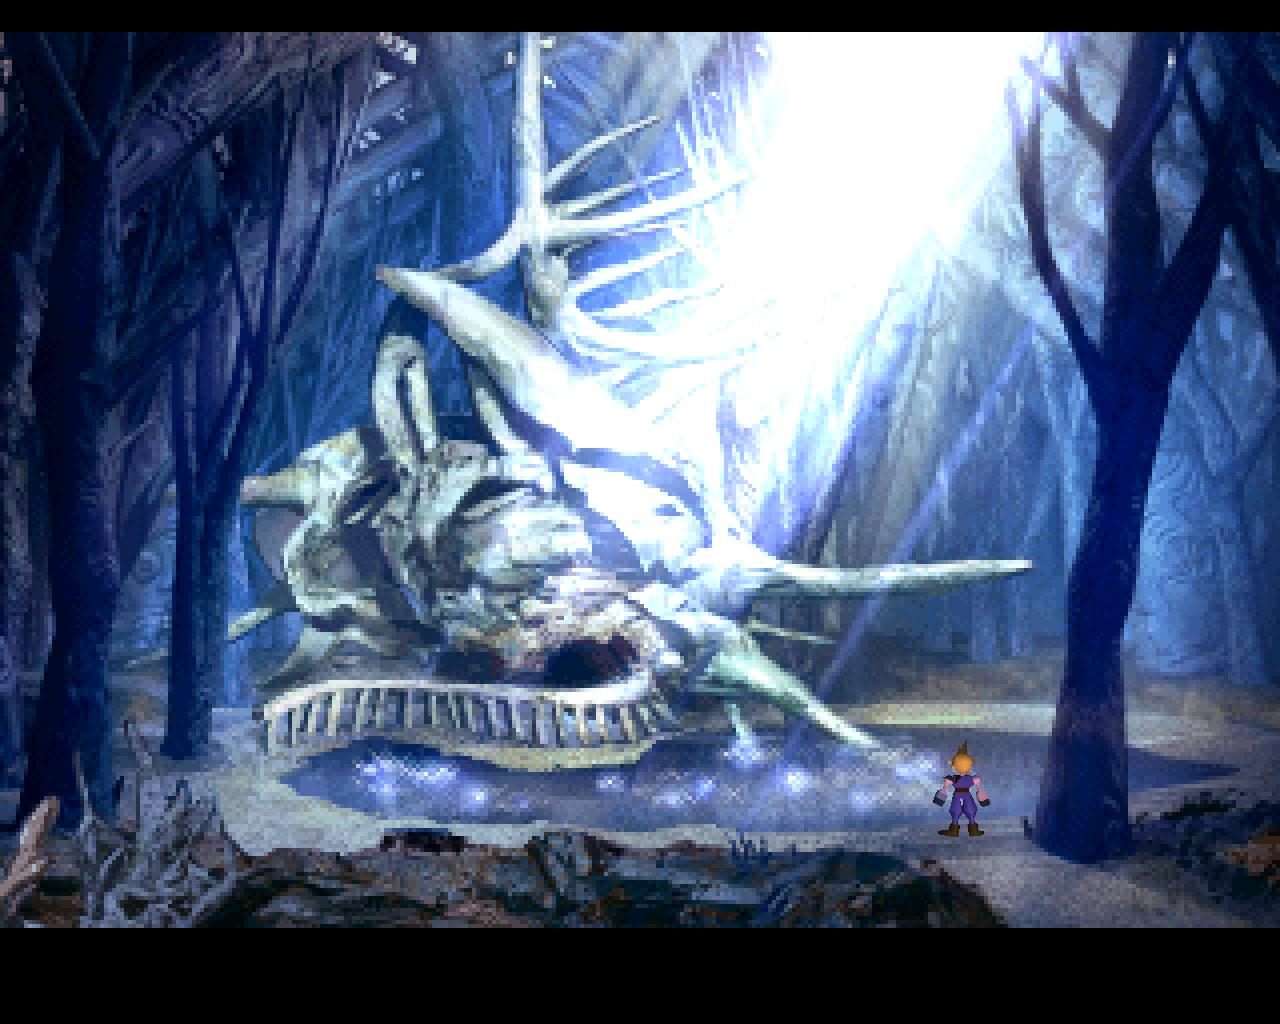 Final Fantasy VII Screenshot 51 city of the ancients dried shell.jpg